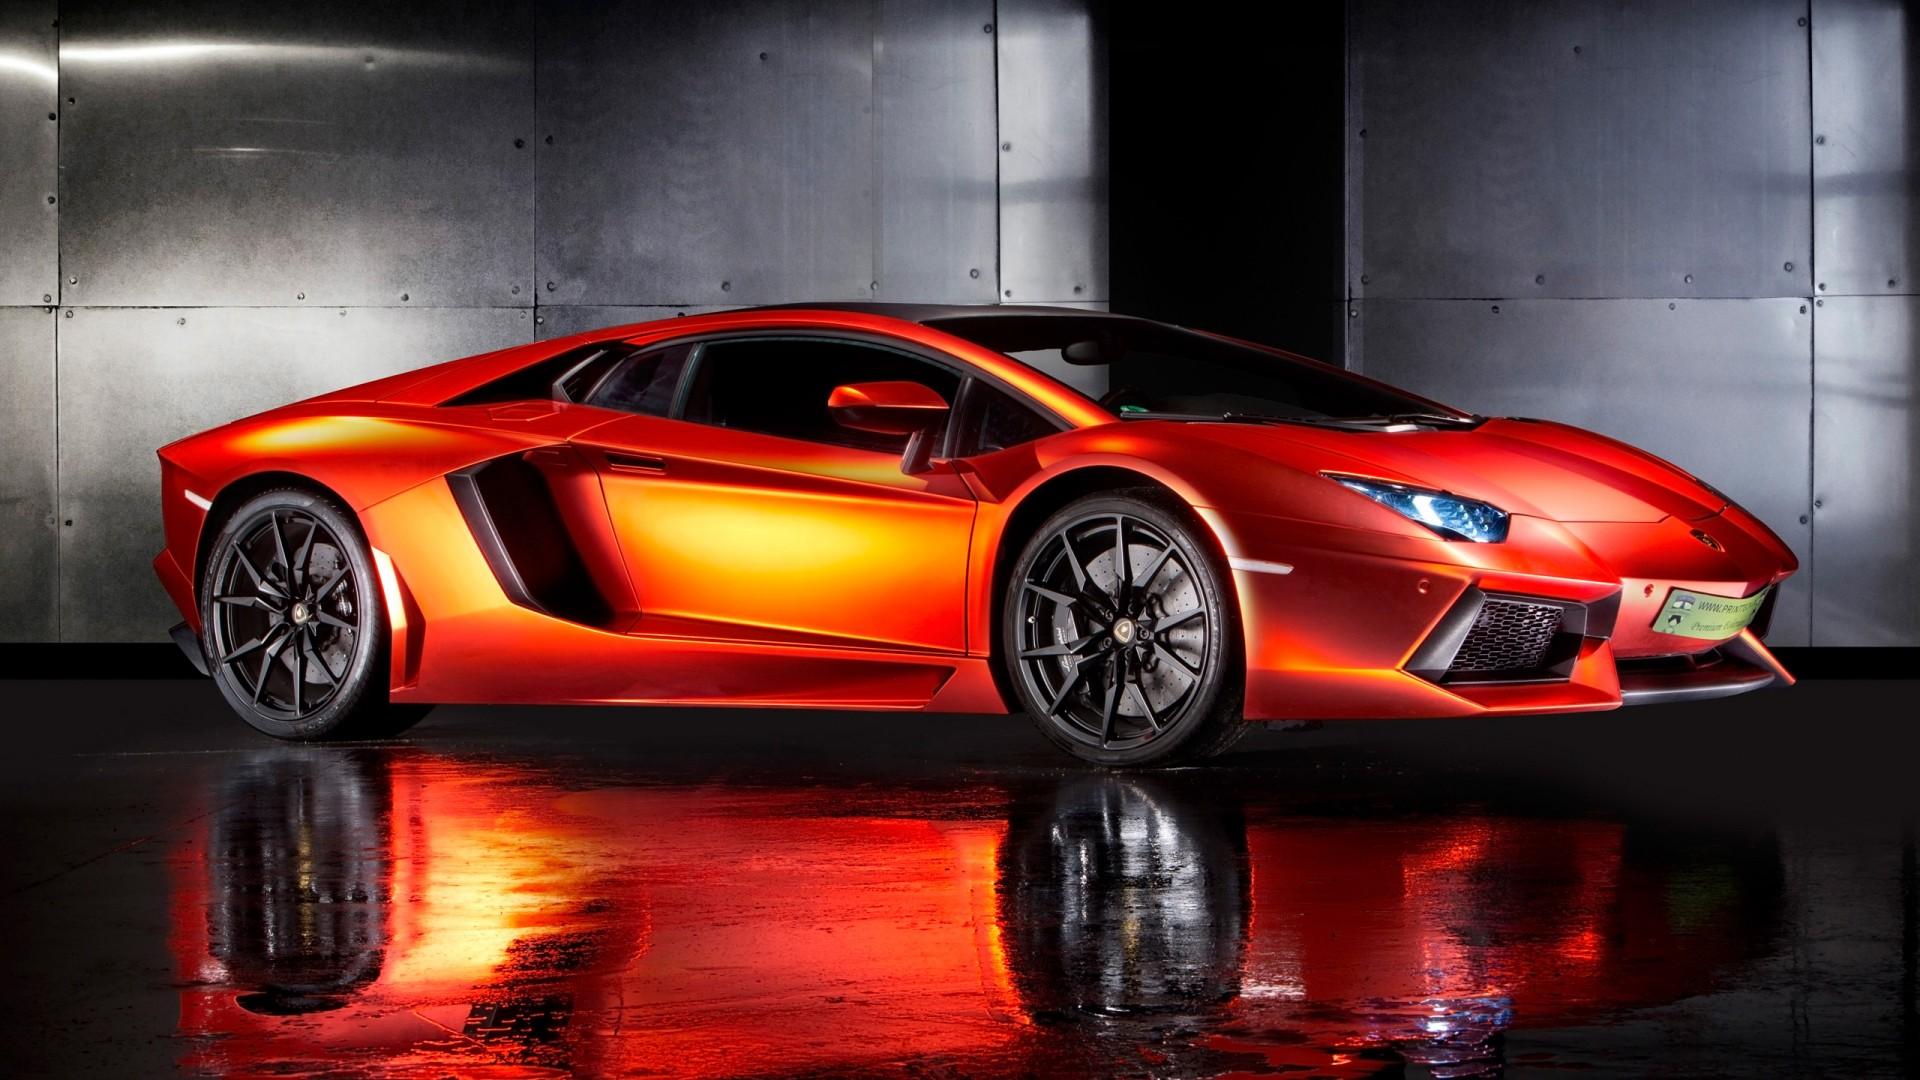 2013 Lamborghini Aventador By Print Tech Wallpaper Hd